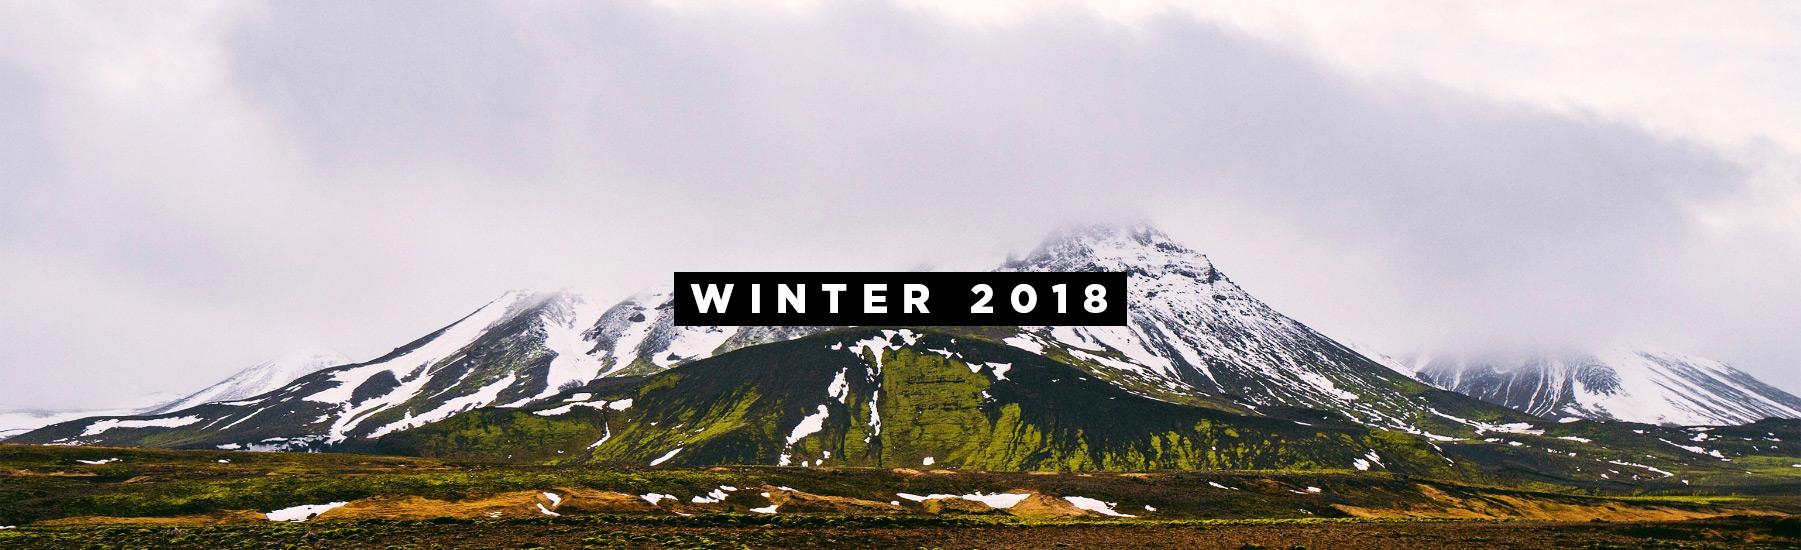 2018 Winter Trends Shop DrJays.com